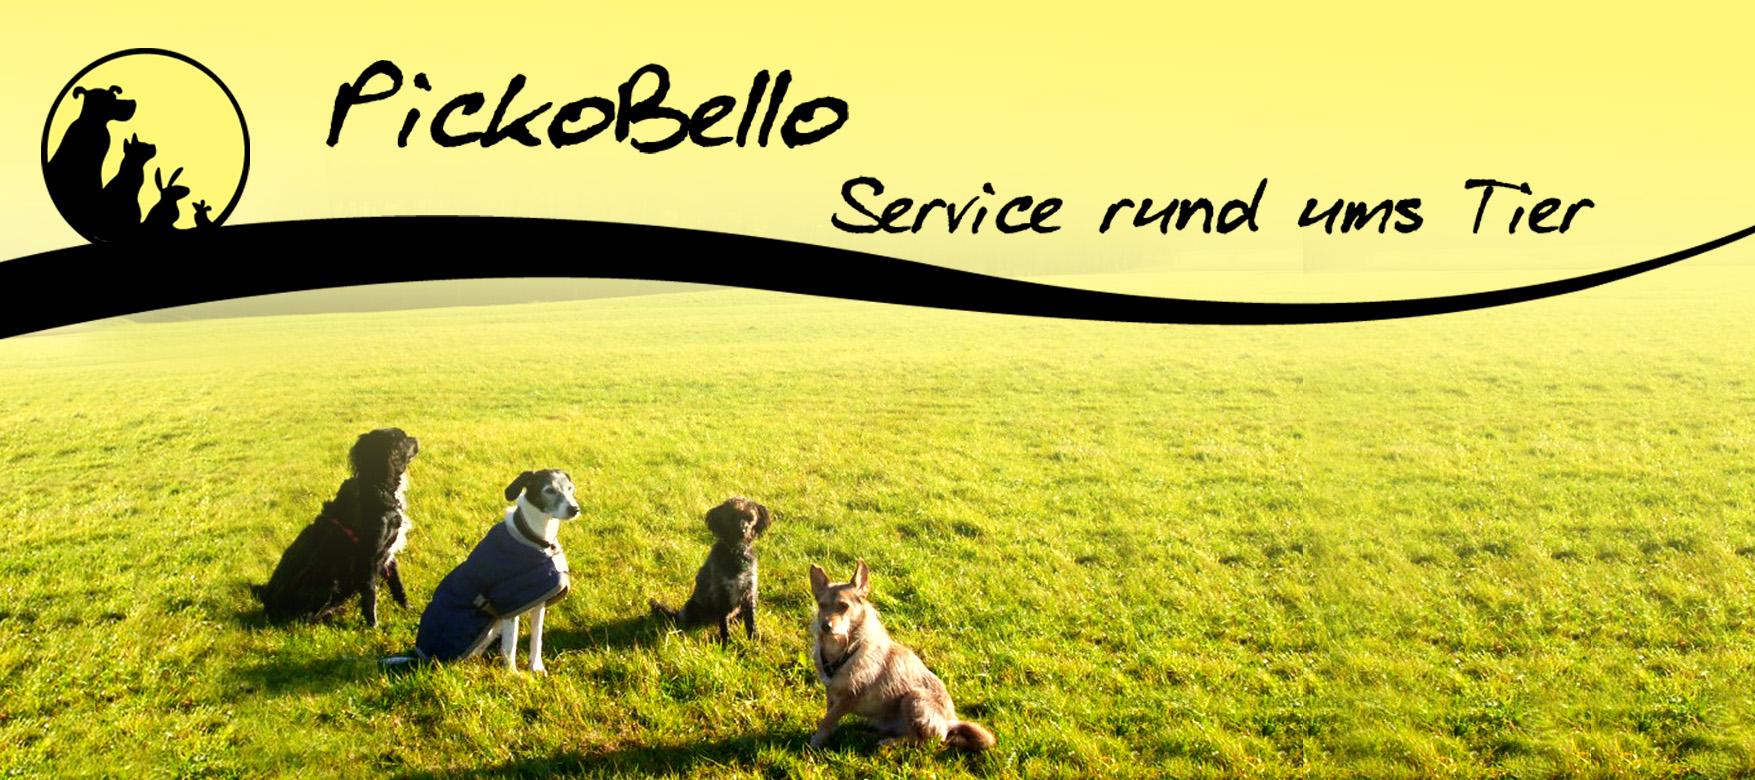 PickoBello Hunde- und Katzenbetreuung